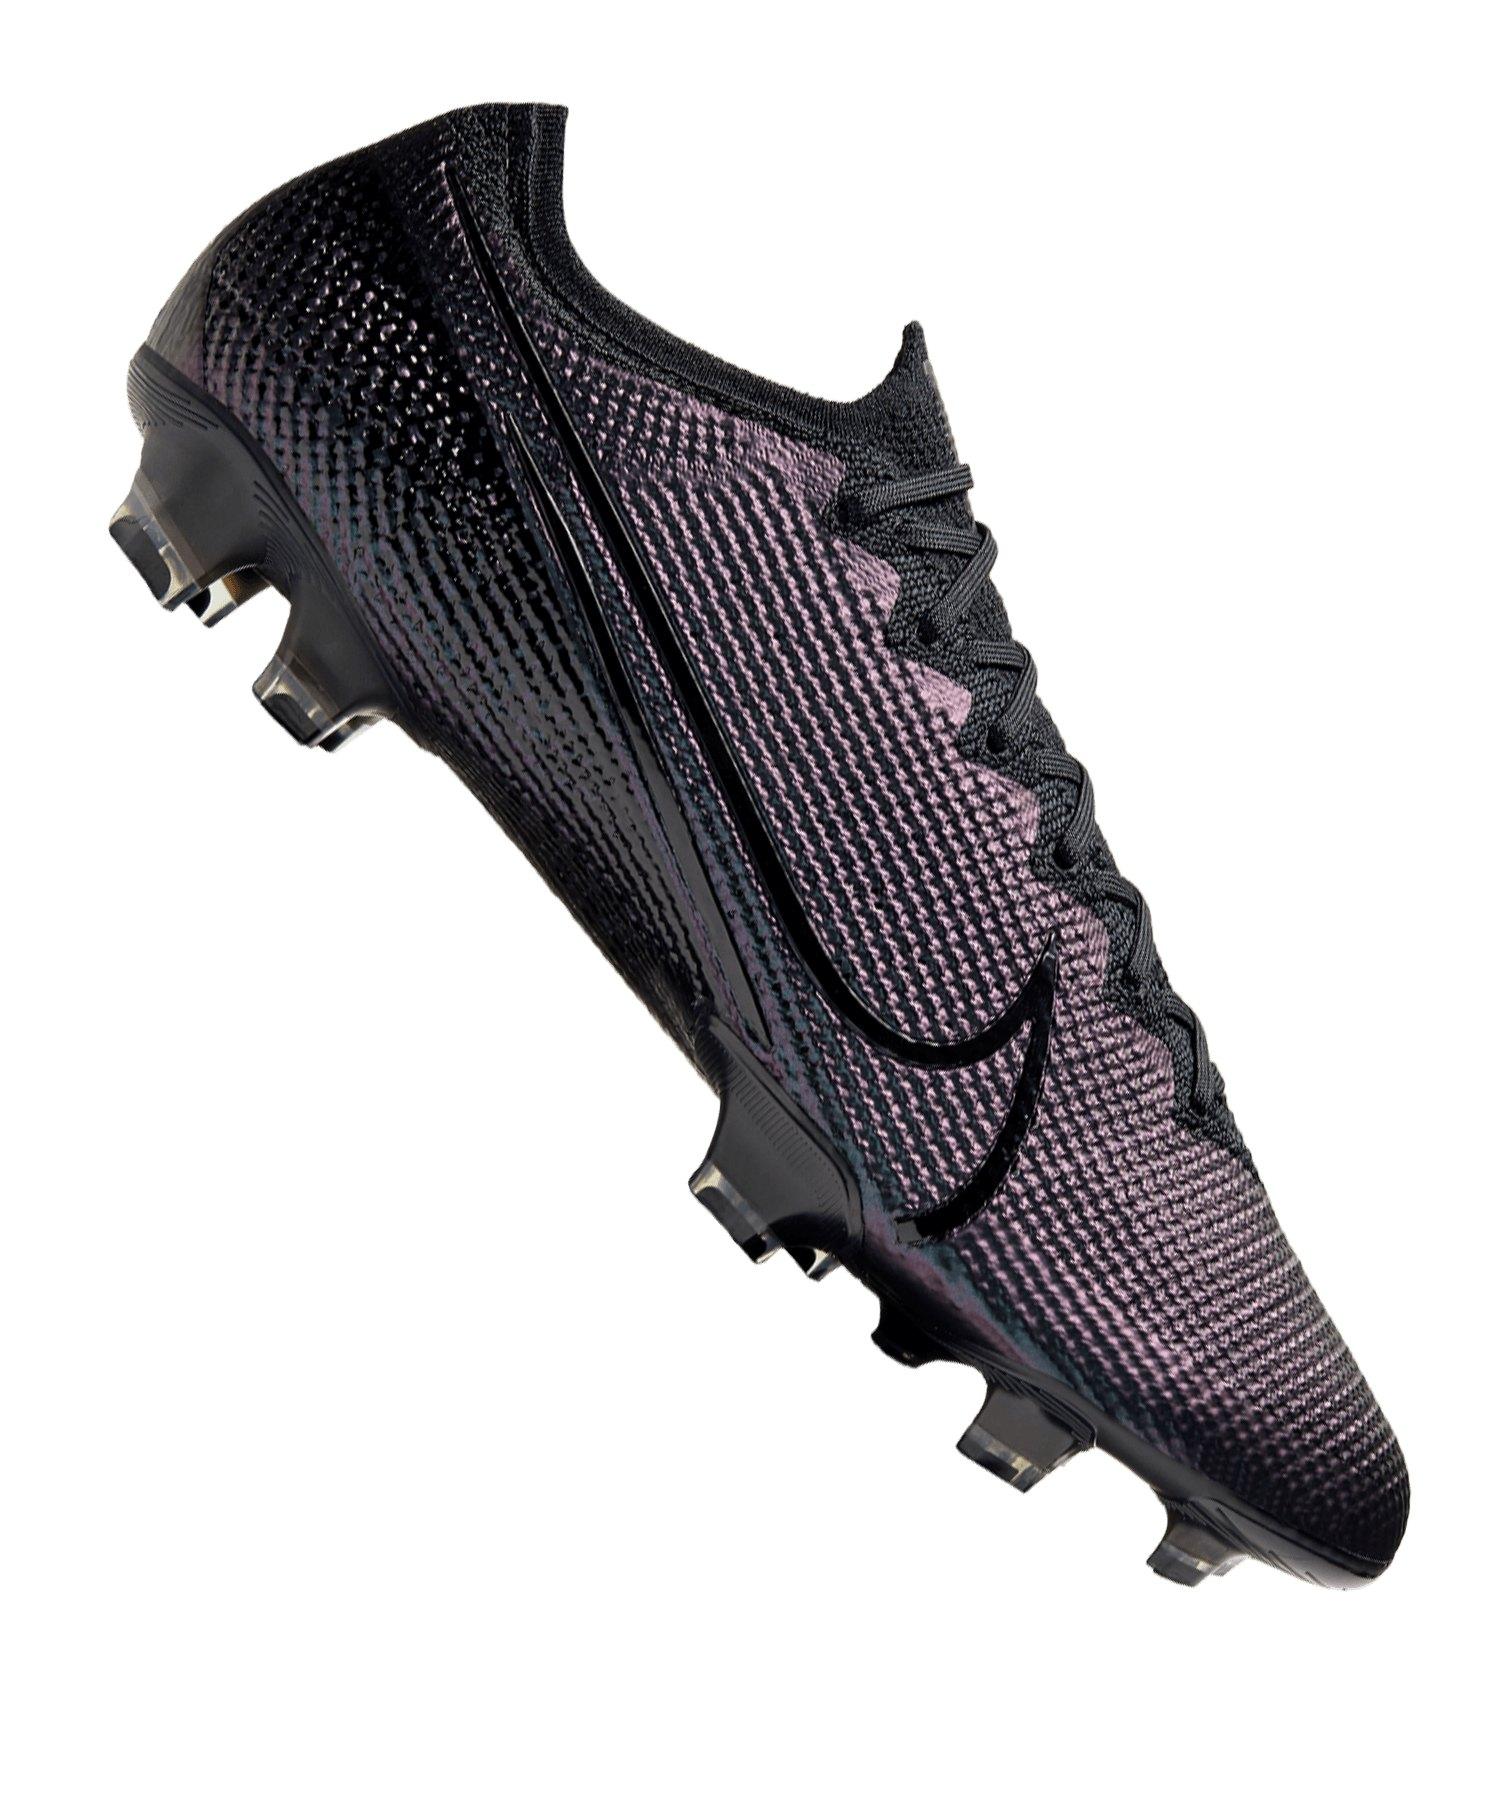 Nike Mercurial Vapor XIII Elite FG Schwarz F010 - schwarz